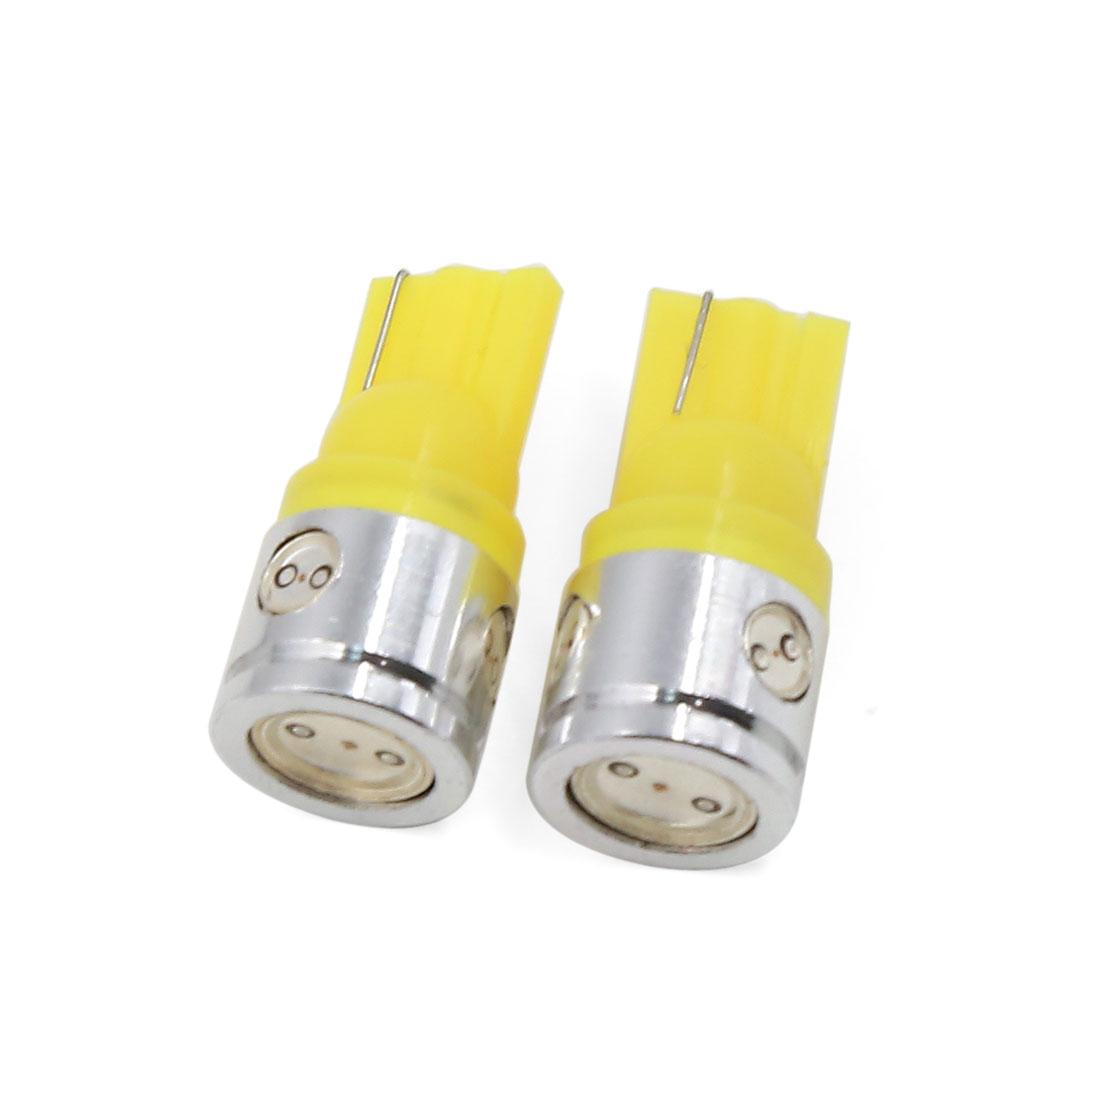 2 Pcs T10 2.5W Yellow 4-LED Bulbs Car Dashboard Light Lamp W5W 194 Interior